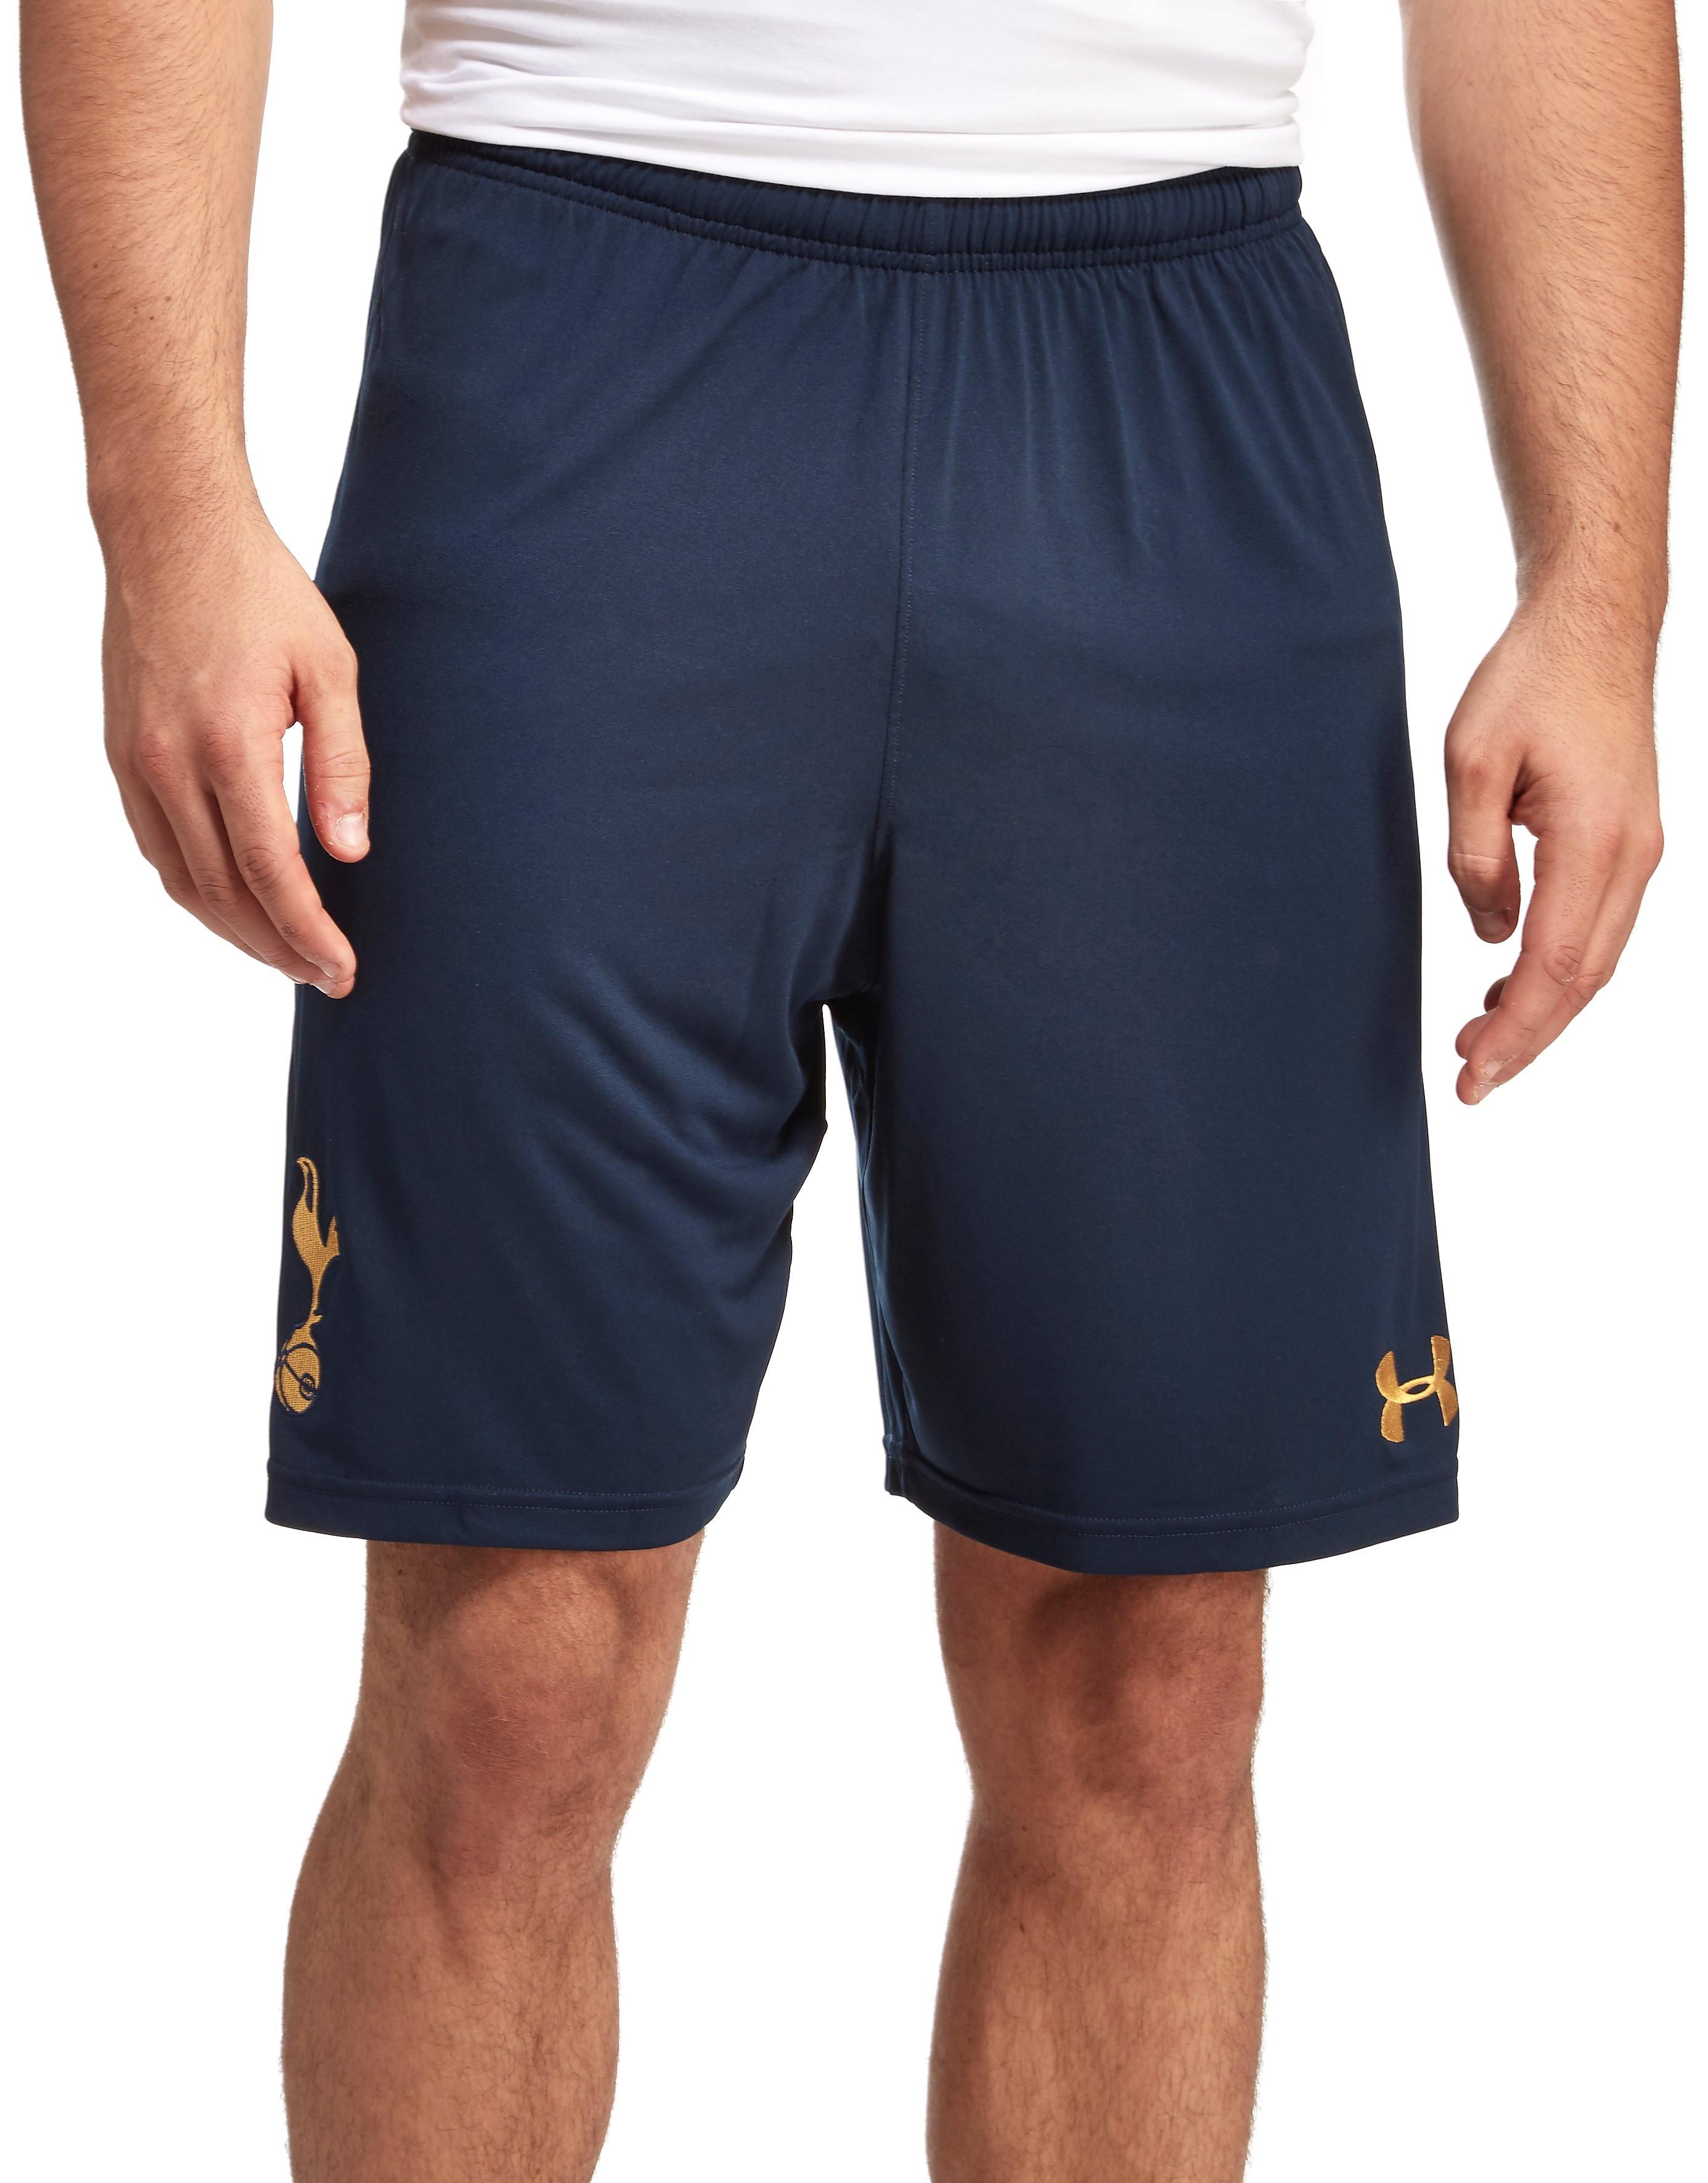 Under Armour Tottenham Hotspur FC 2016/17 Away Shorts